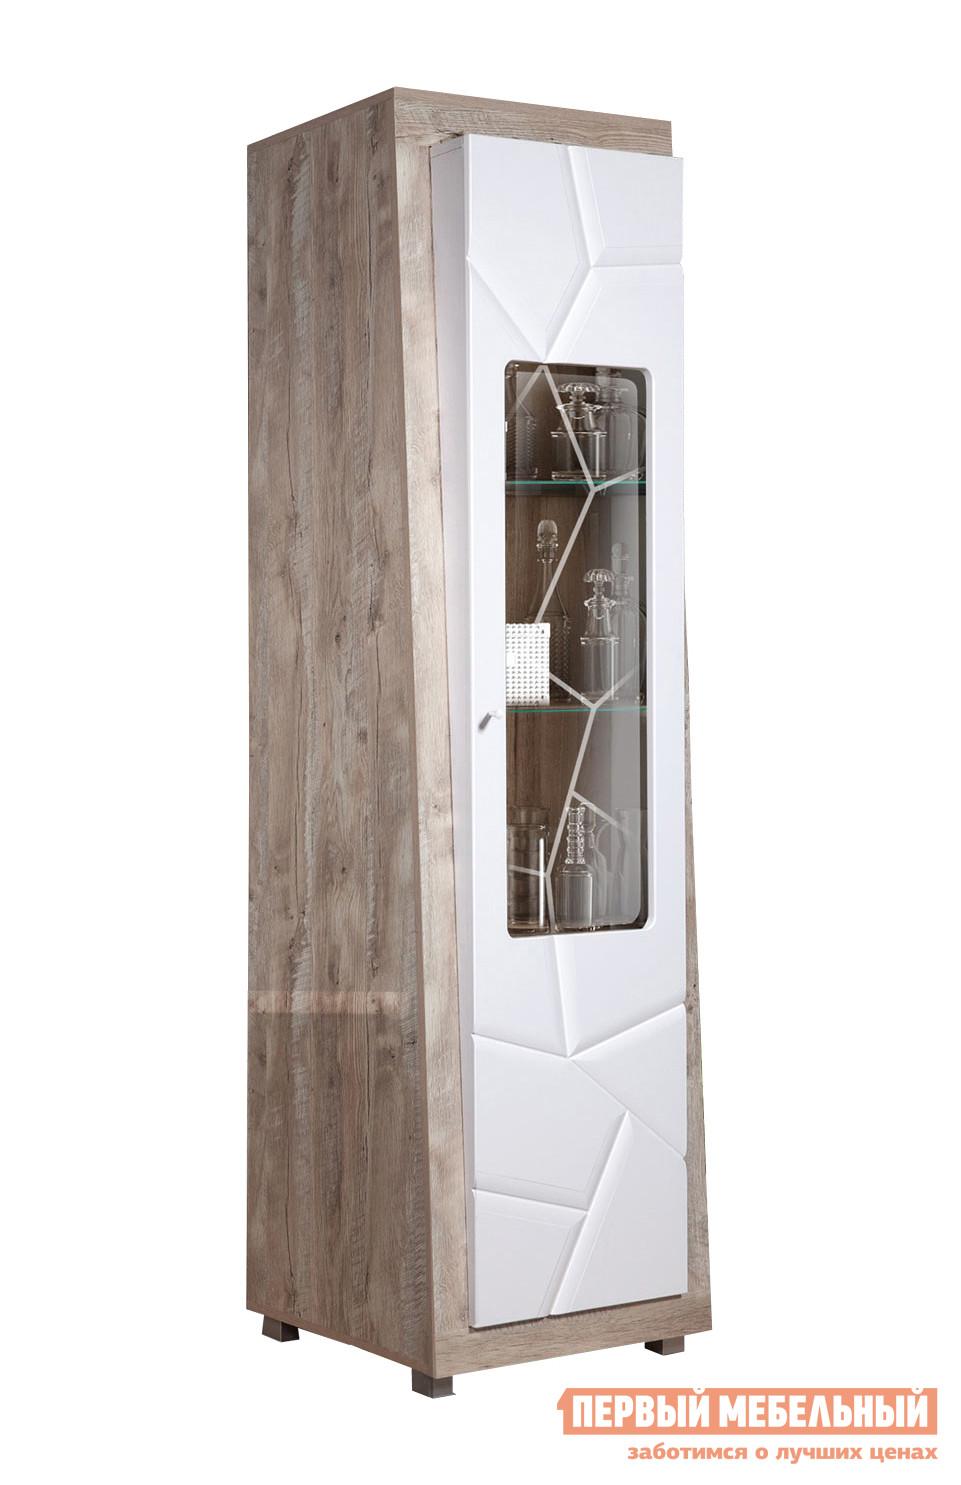 Шкаф-витрина ТД Арника Шкаф с витриной «Л Кензо 1» КМК 0674.22 / Шкаф с витриной «П Кензо 1» КМК 0674.23